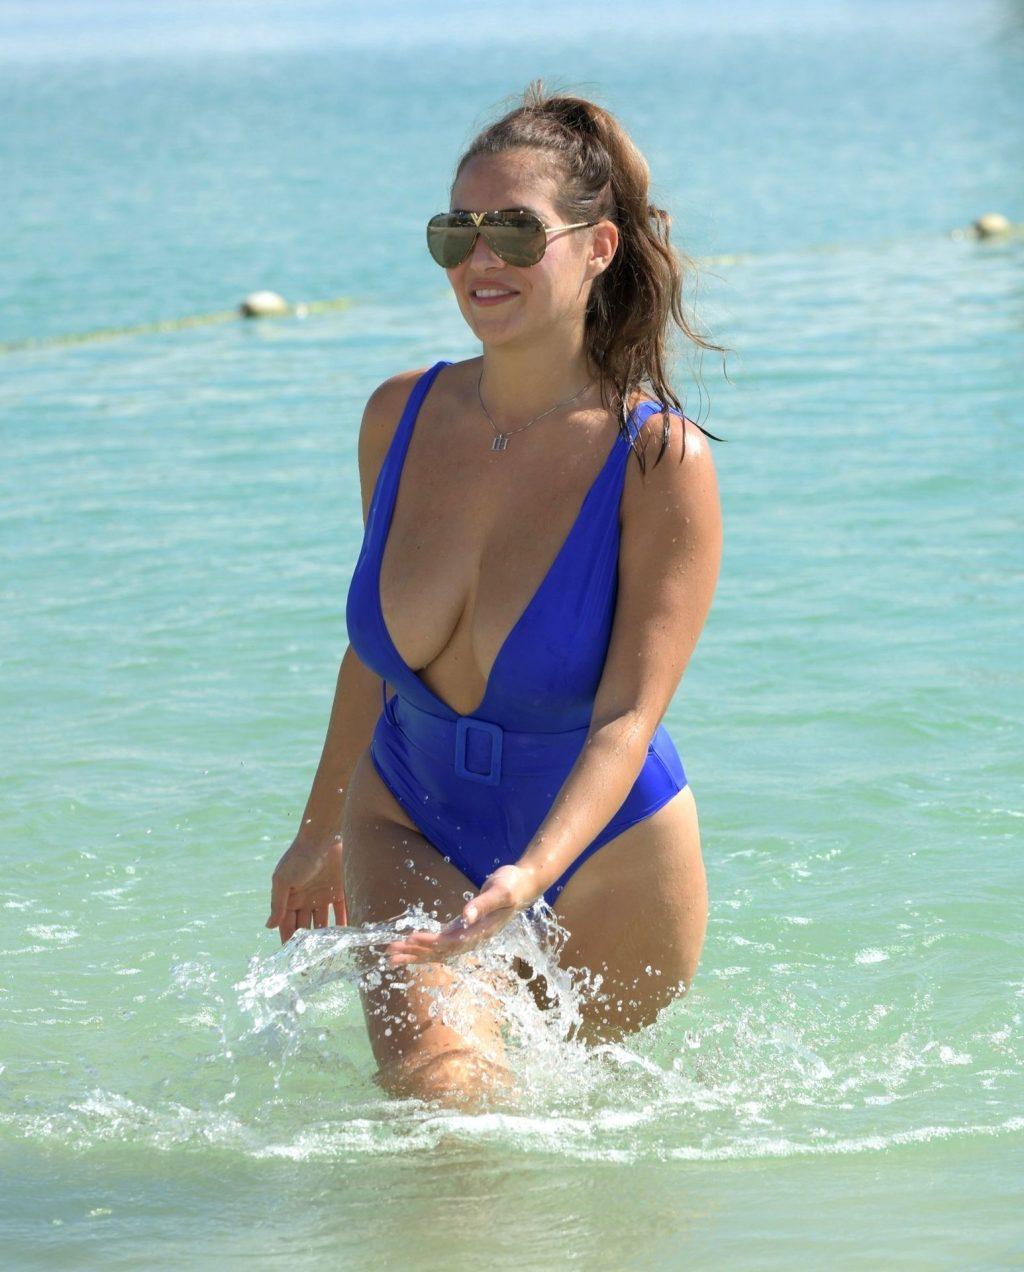 Chloe Goodman Stuns in Her Sexy Blue Swimsuit in Dubai (12 Photos)